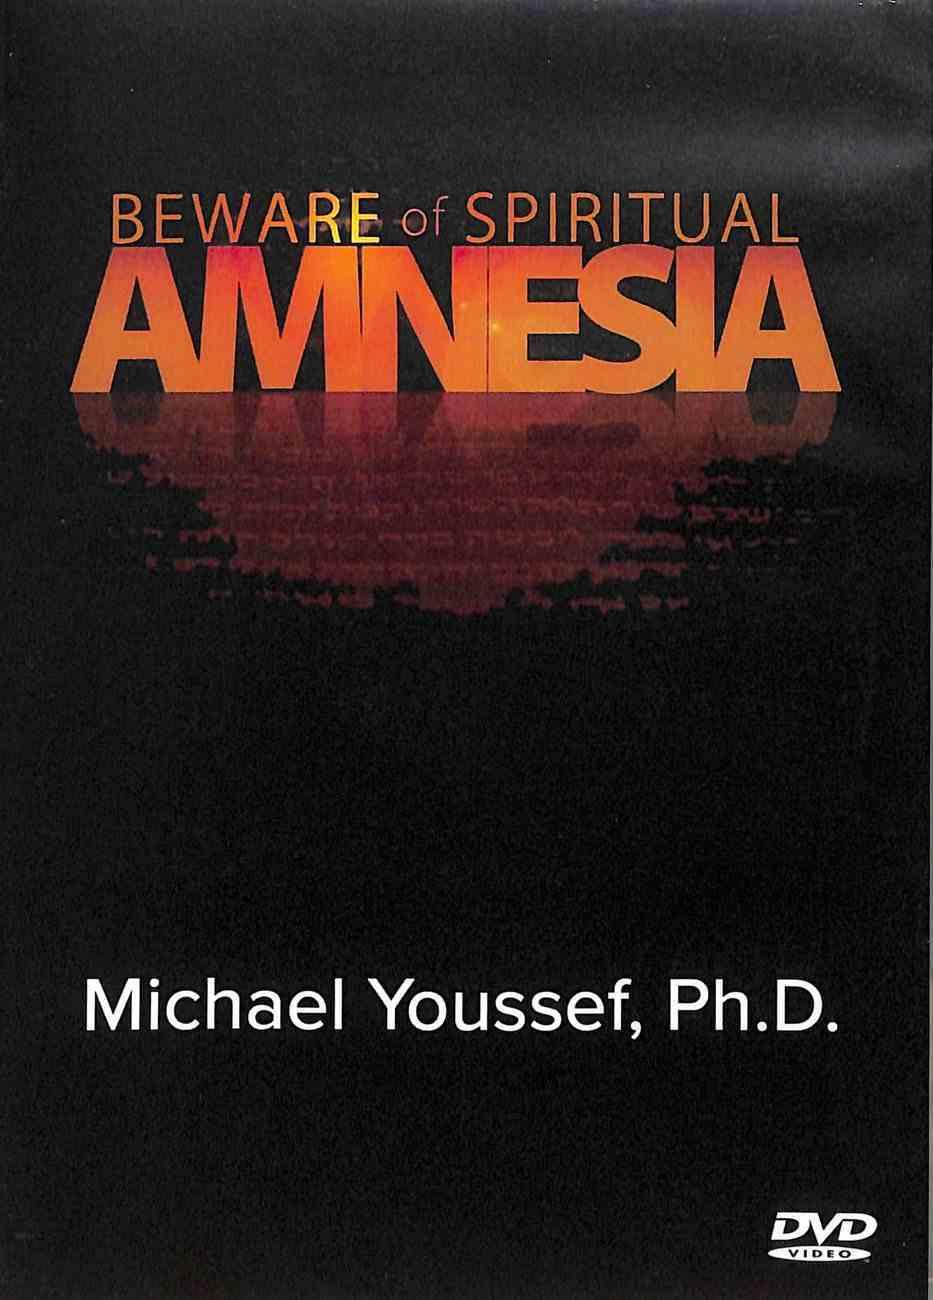 Beware of Spiritual Amnesia DVD